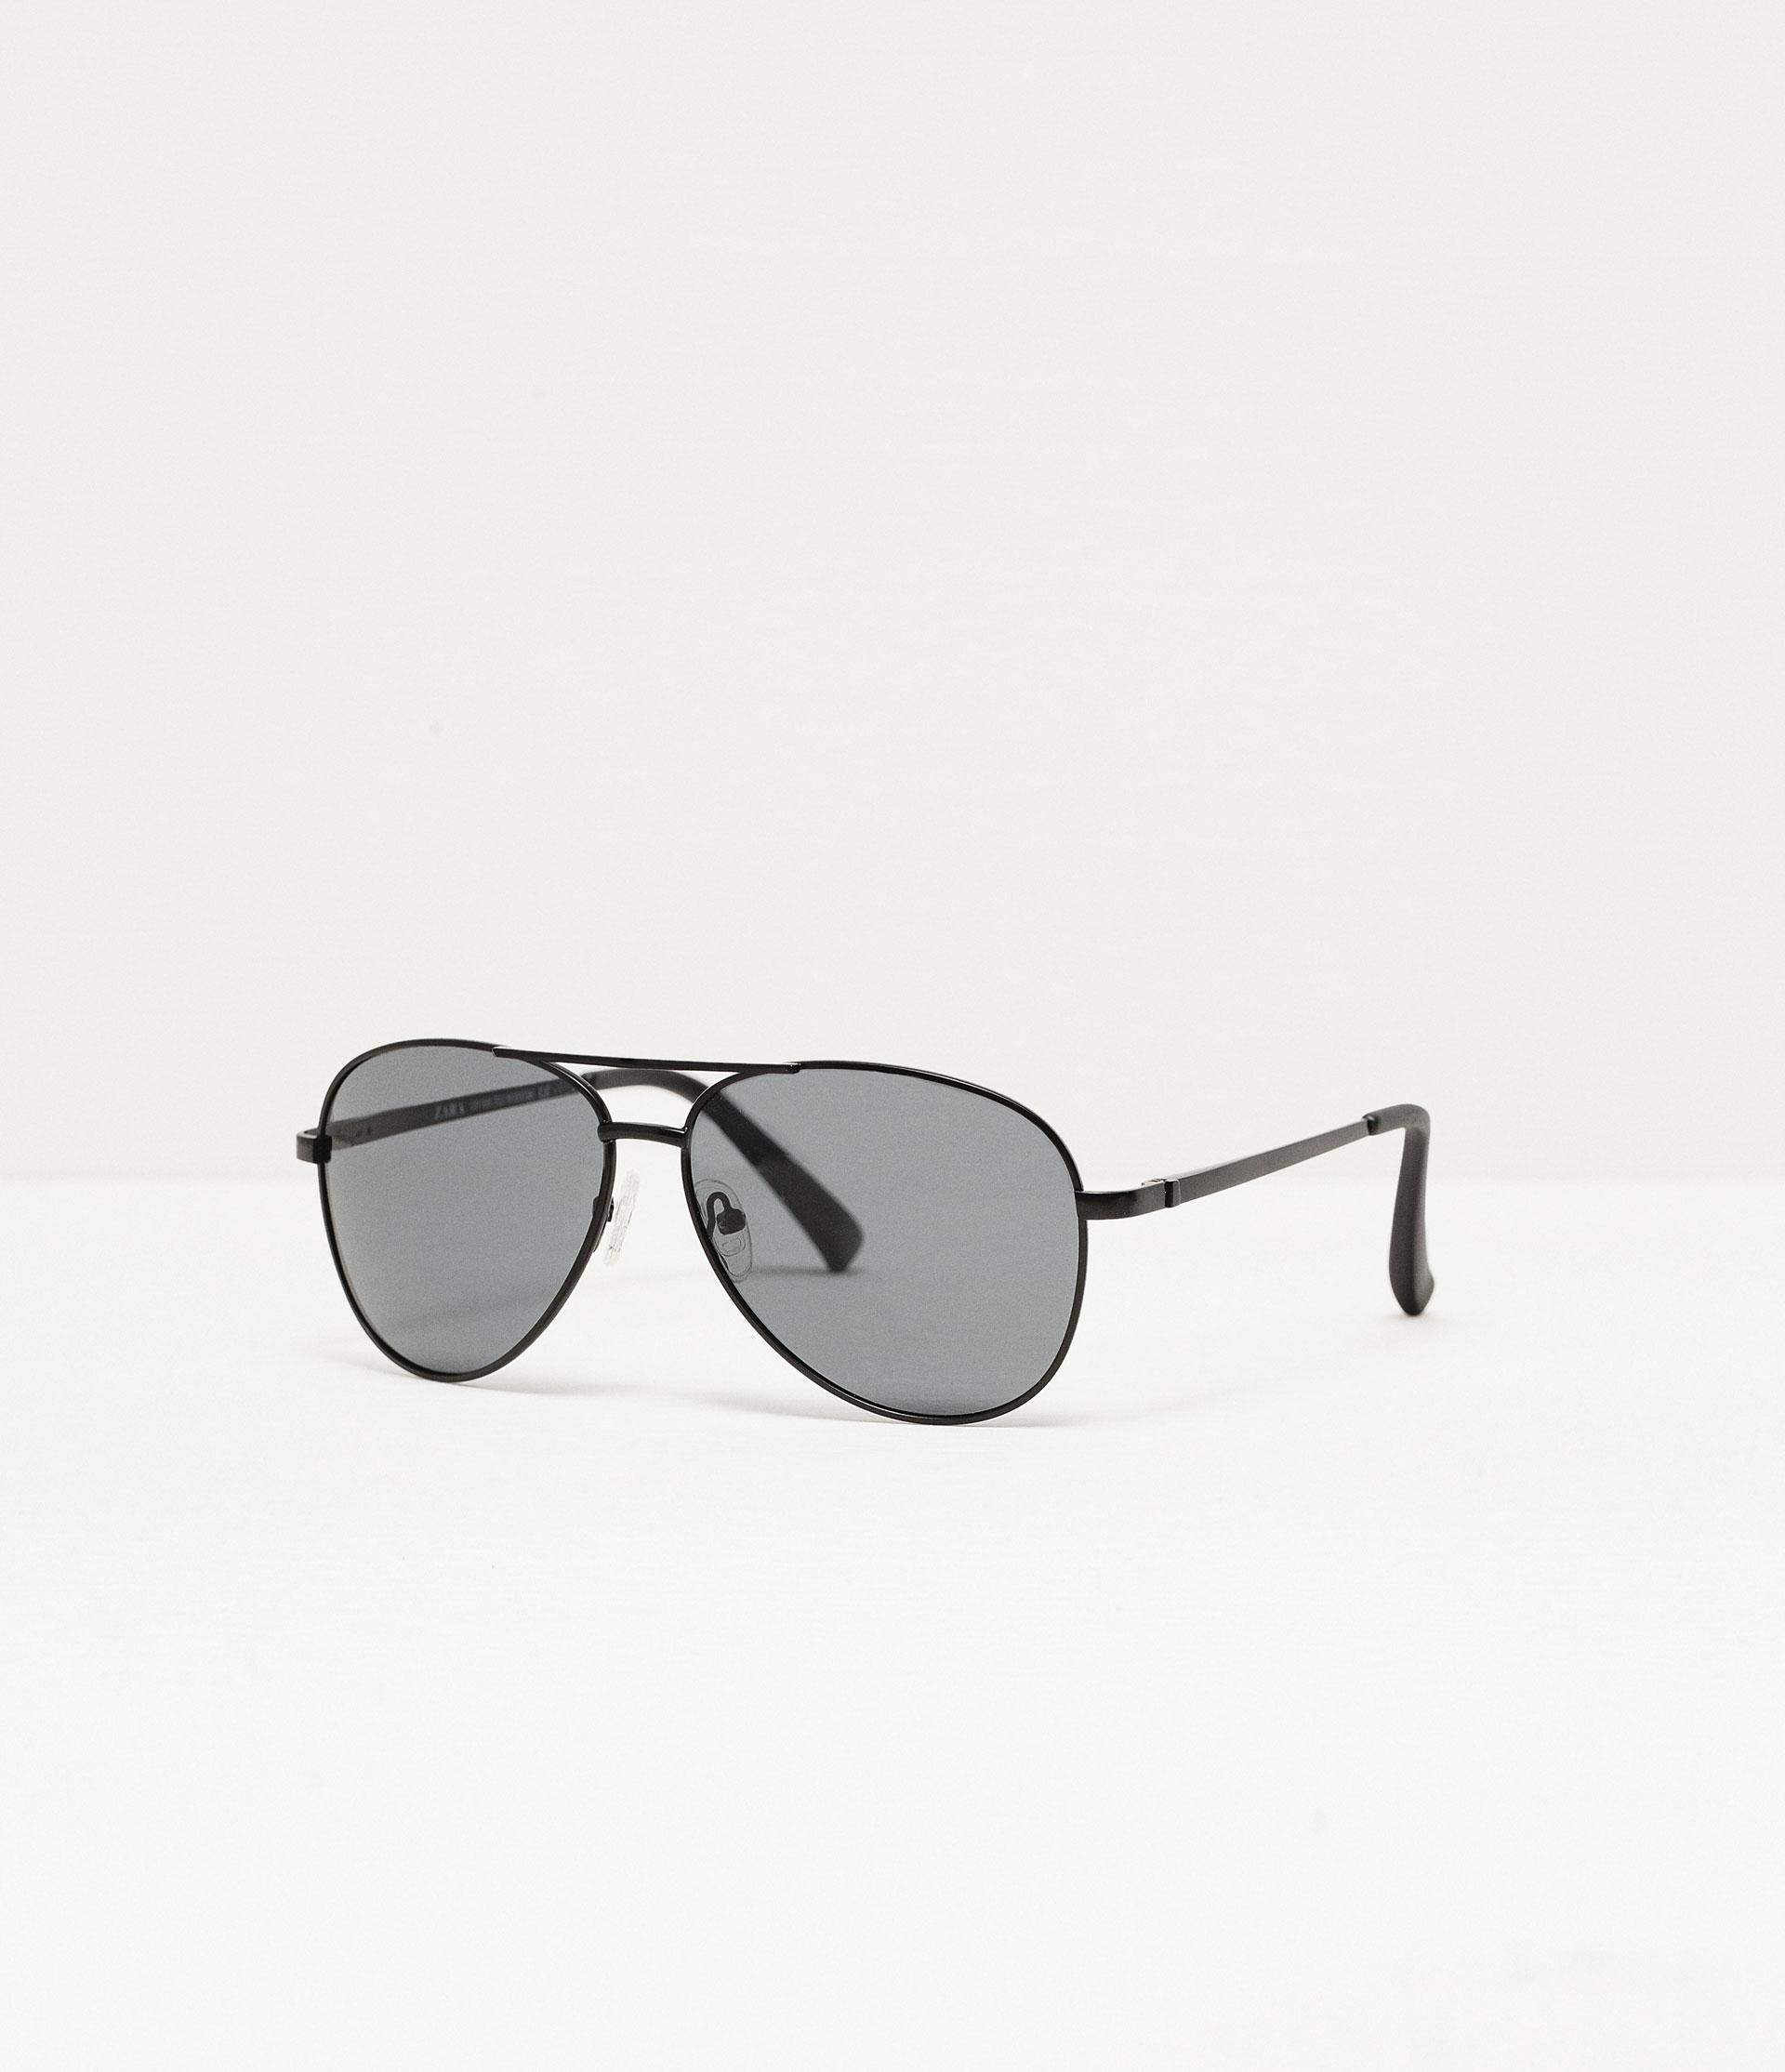 Zara Glasses Frames : Zara Oval Metal Frame Sunglasses in Black for Men Lyst